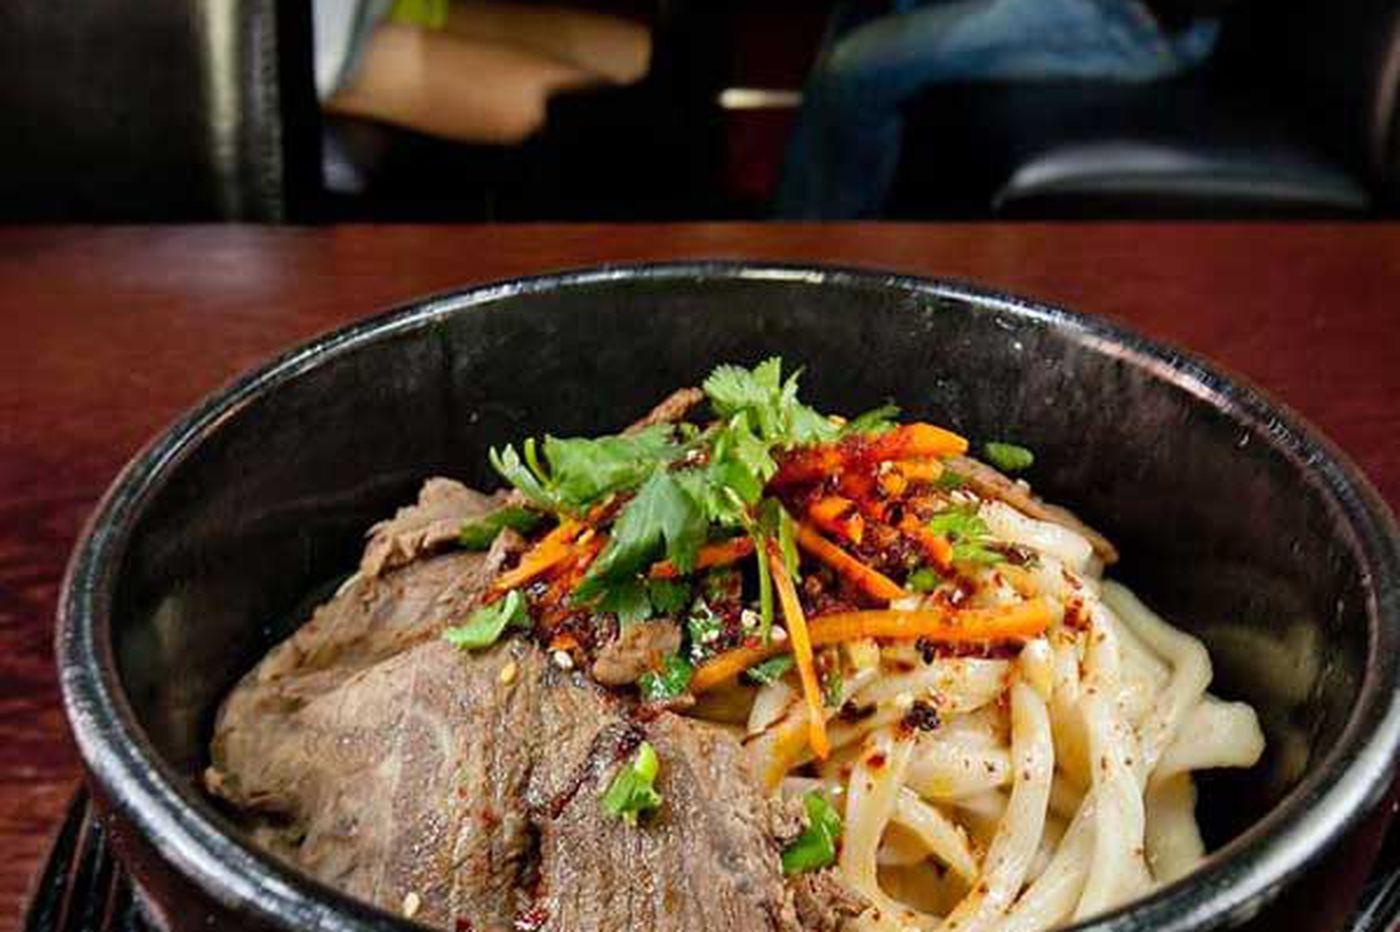 Good Taste: Spicy new noodles